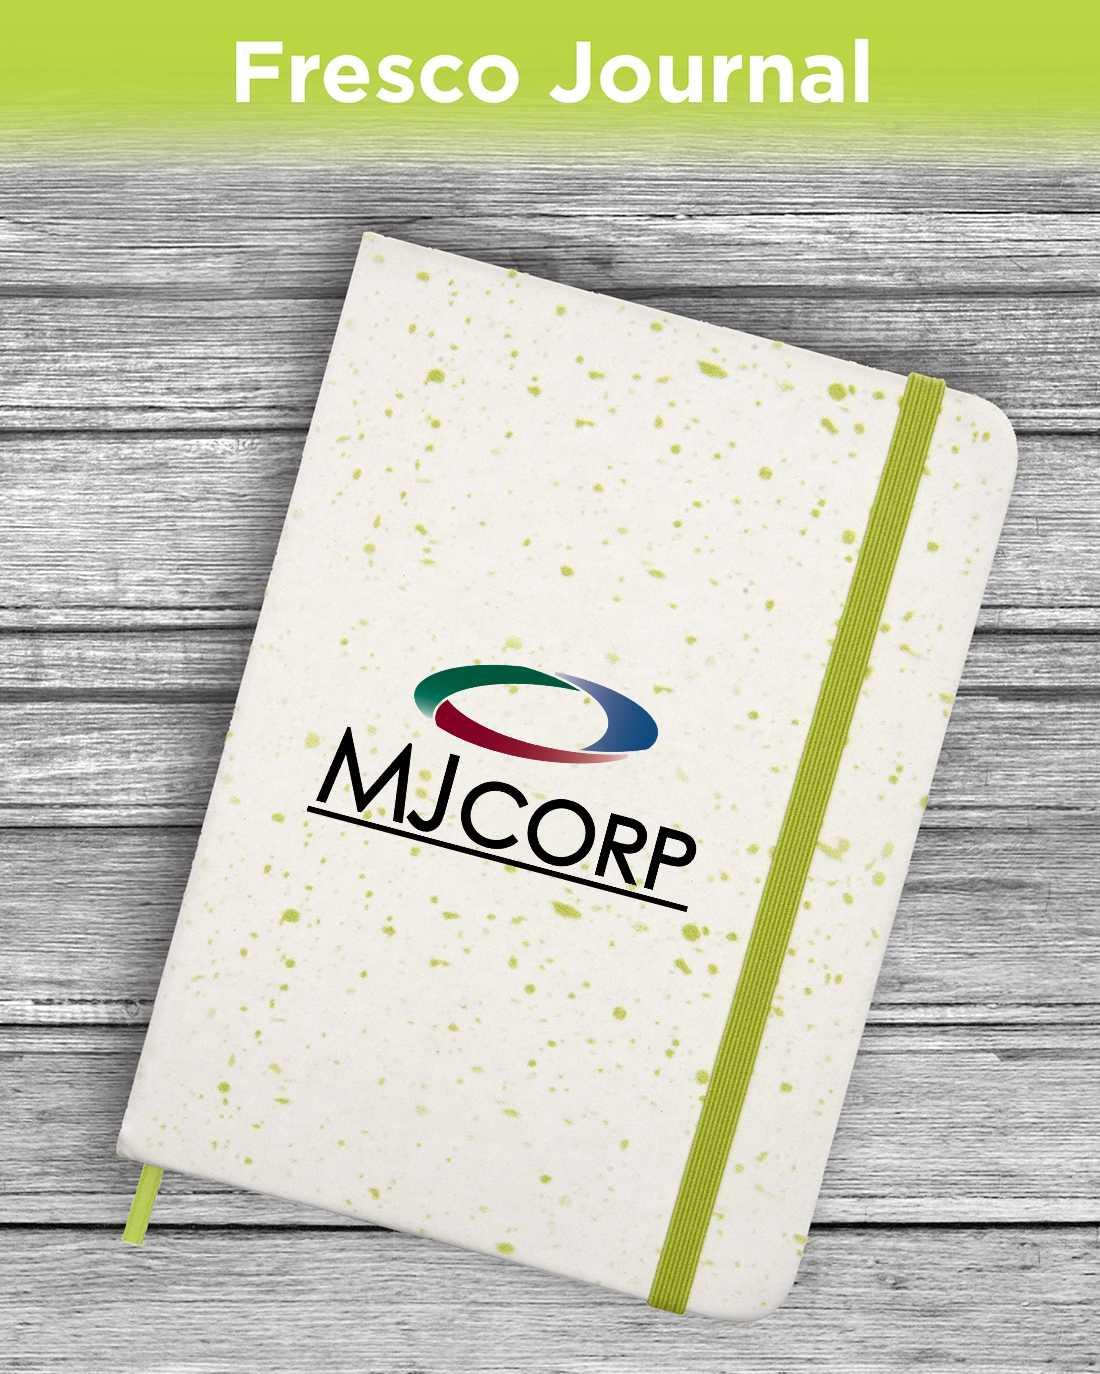 Fresco Journal AIM